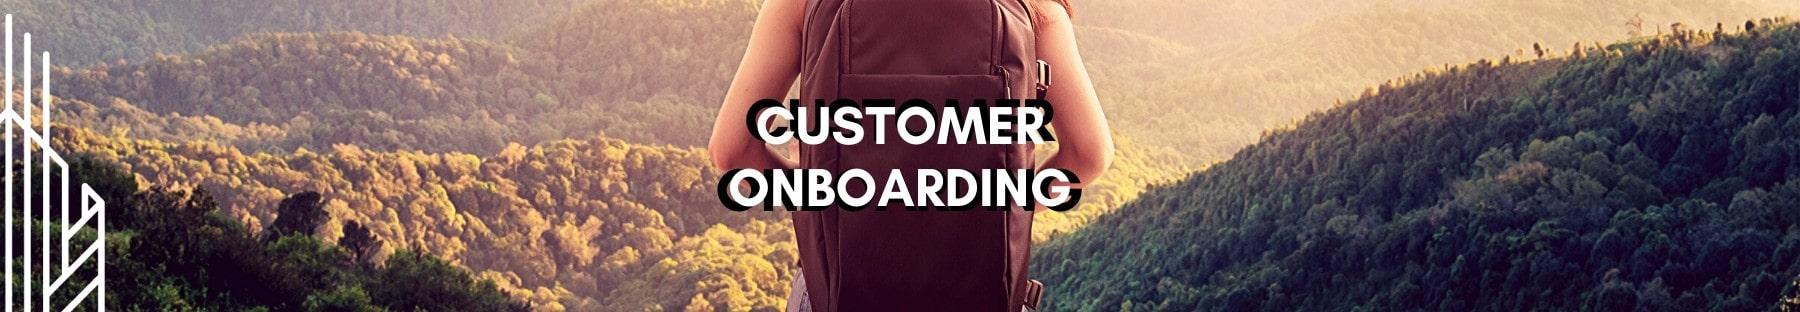 Customer Onboarding 1